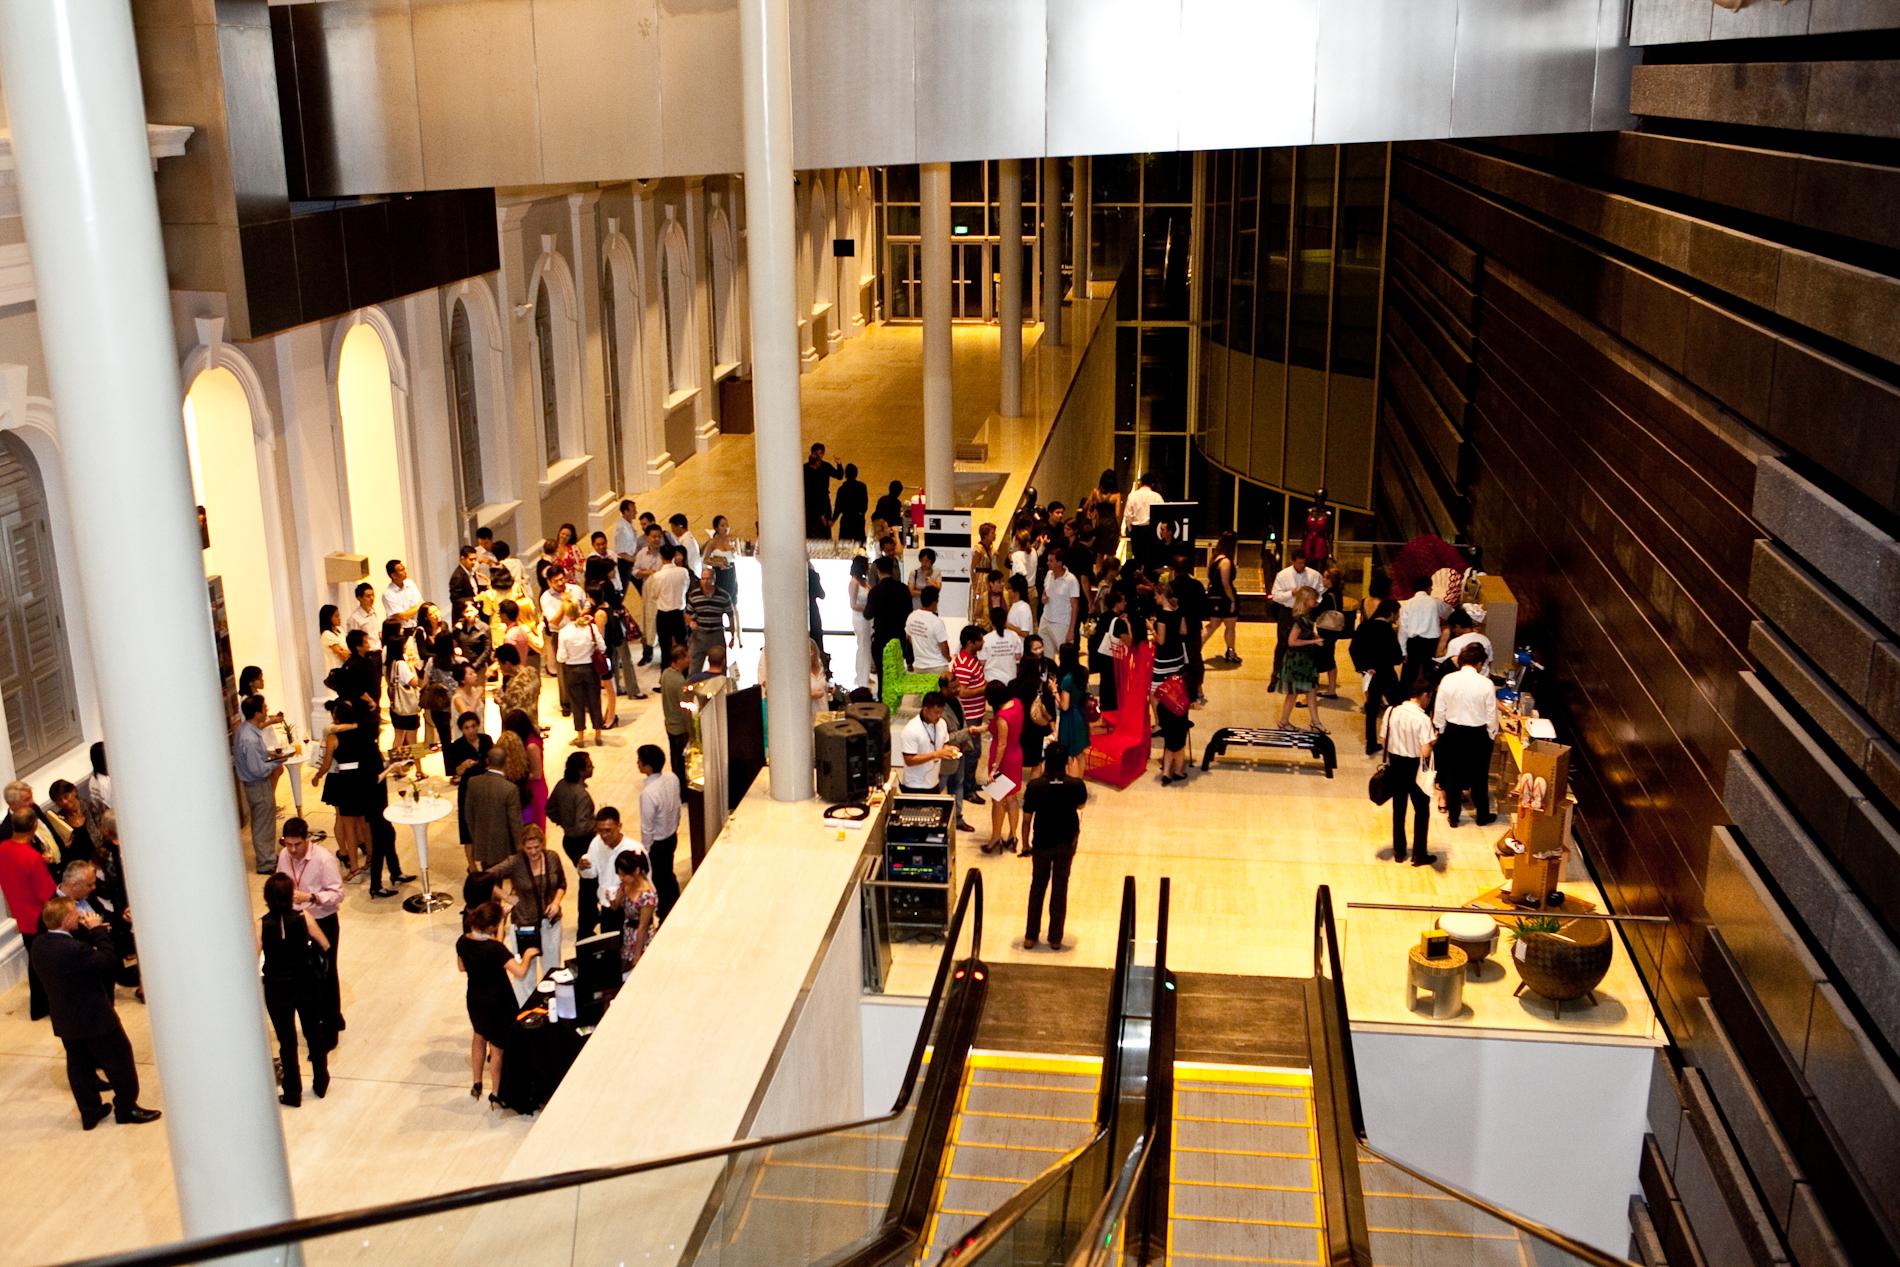 qi-global-2009-sustaible-design-singapore-153.jpg